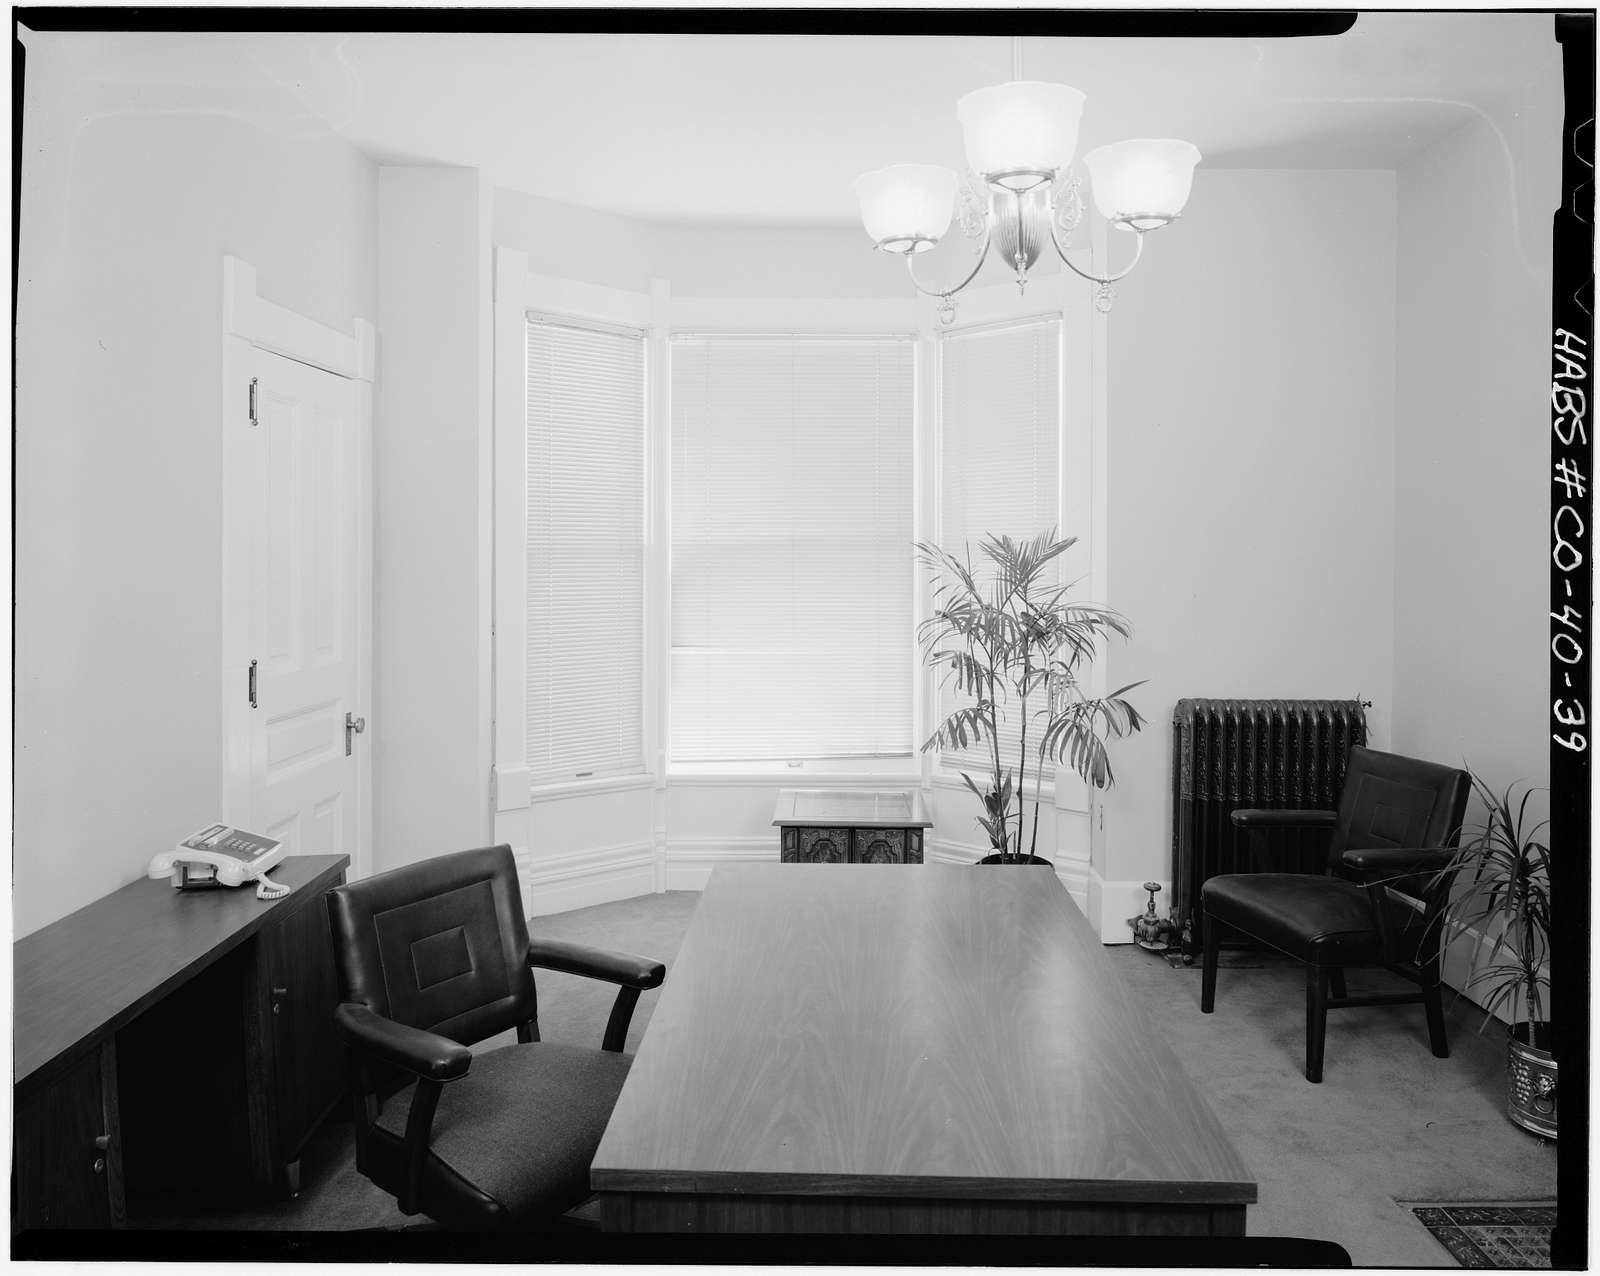 George Schleier Mansion, 1665 Grant Street, Denver, Denver County, CO